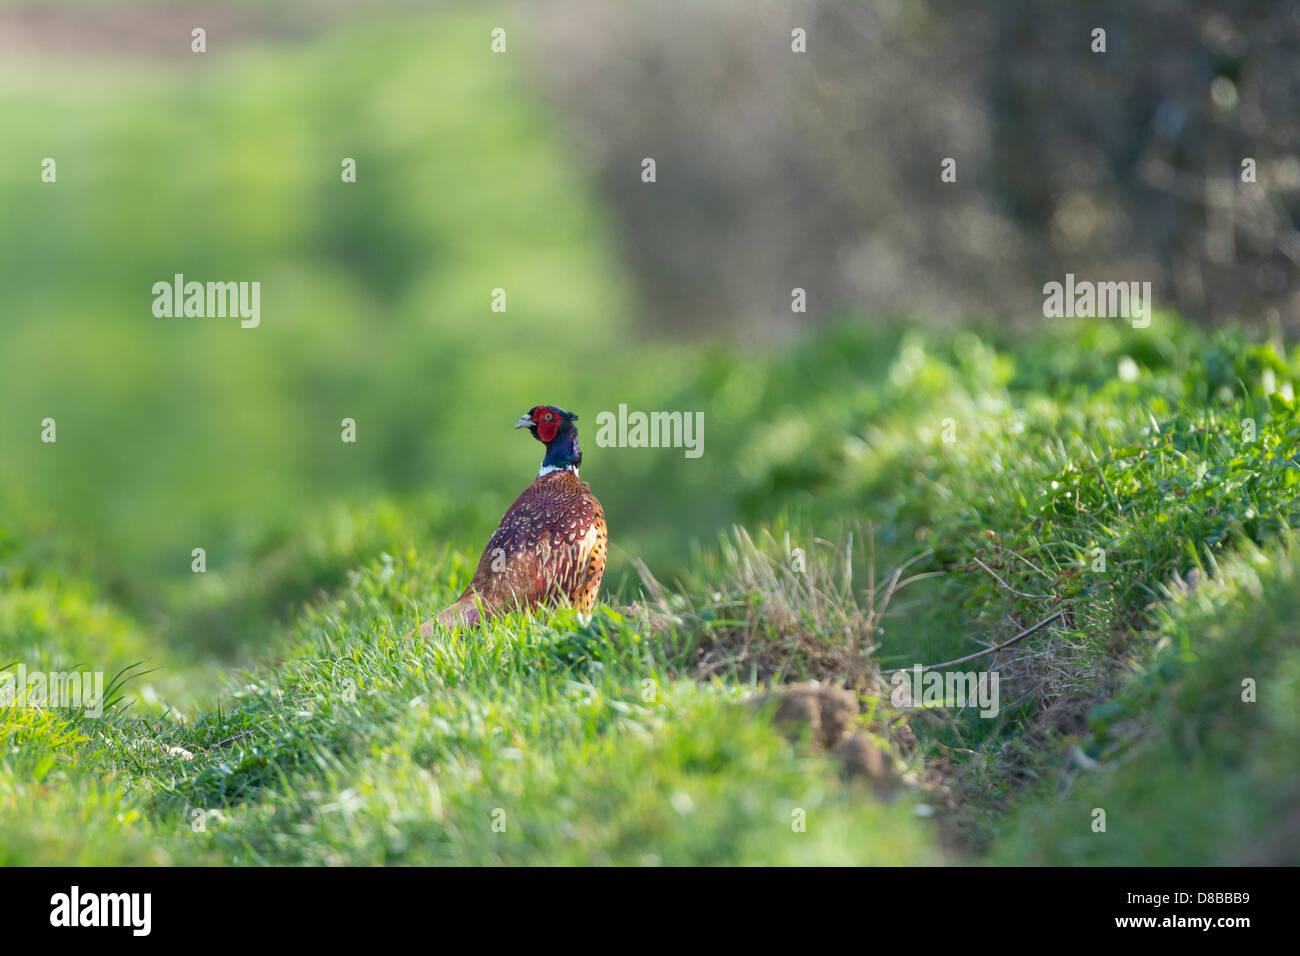 Common pheasant, Phasianus colchicus, male bird on headland, - Stock Image